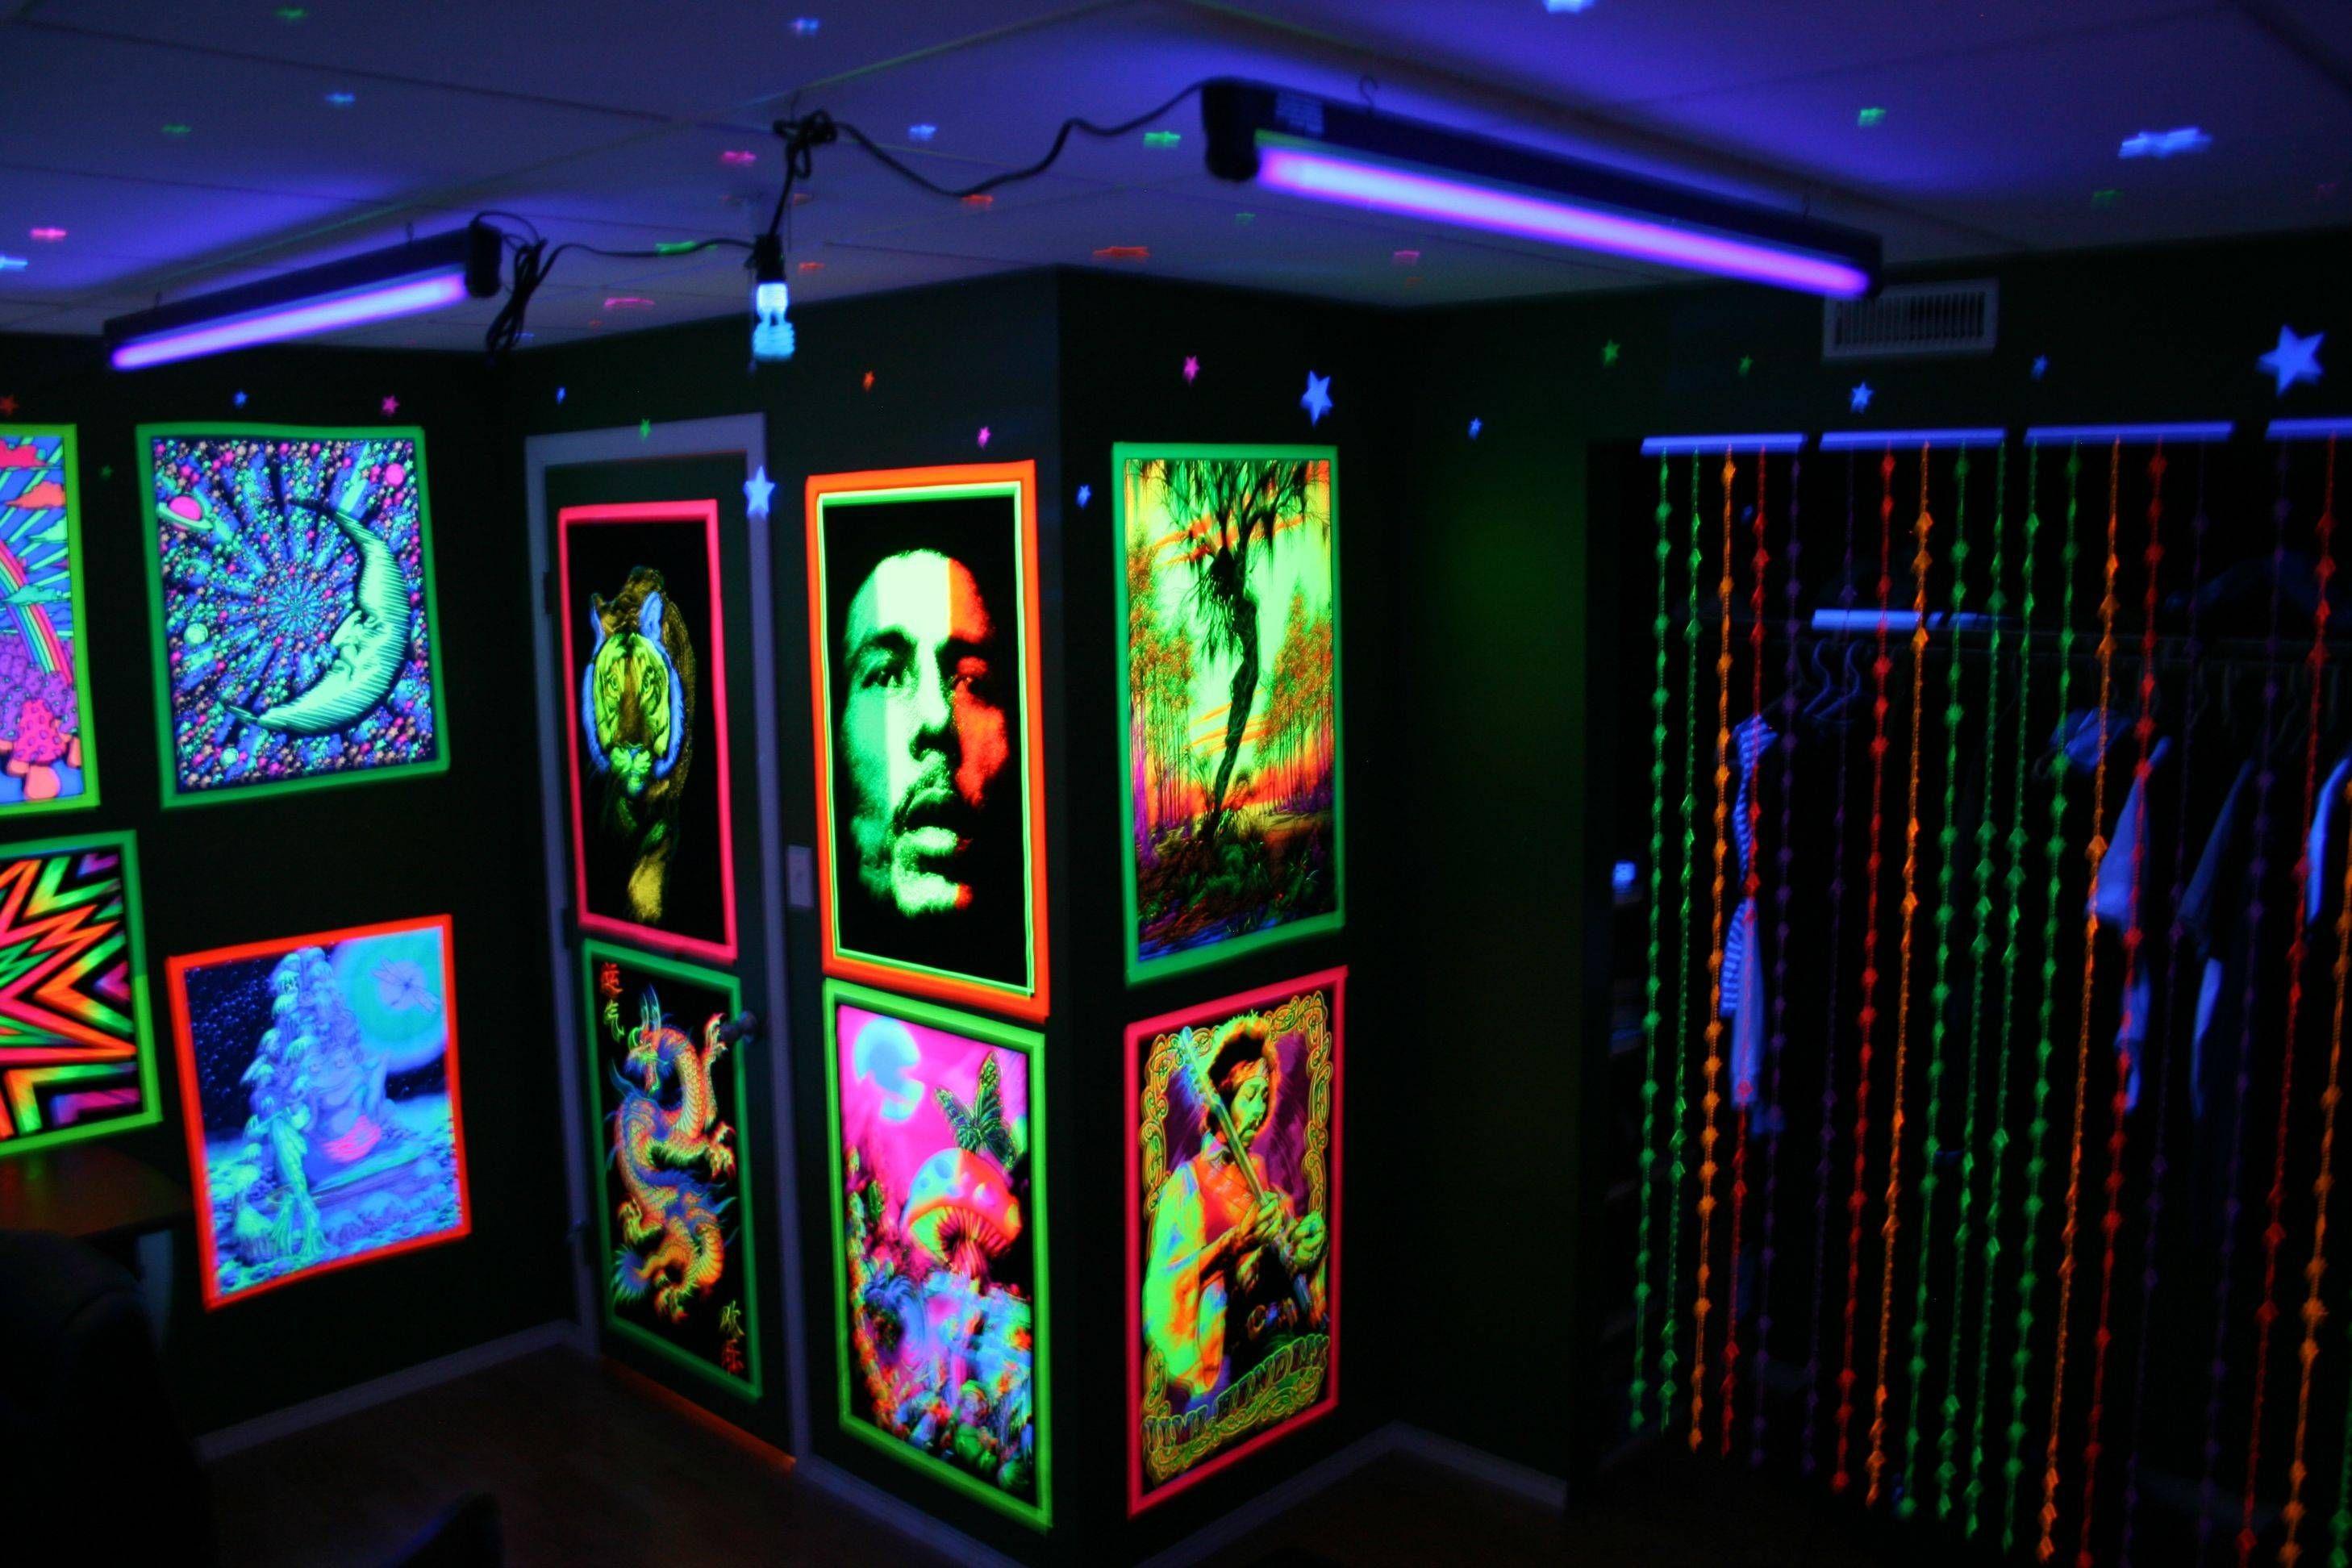 Stoner Room, Hippy Room